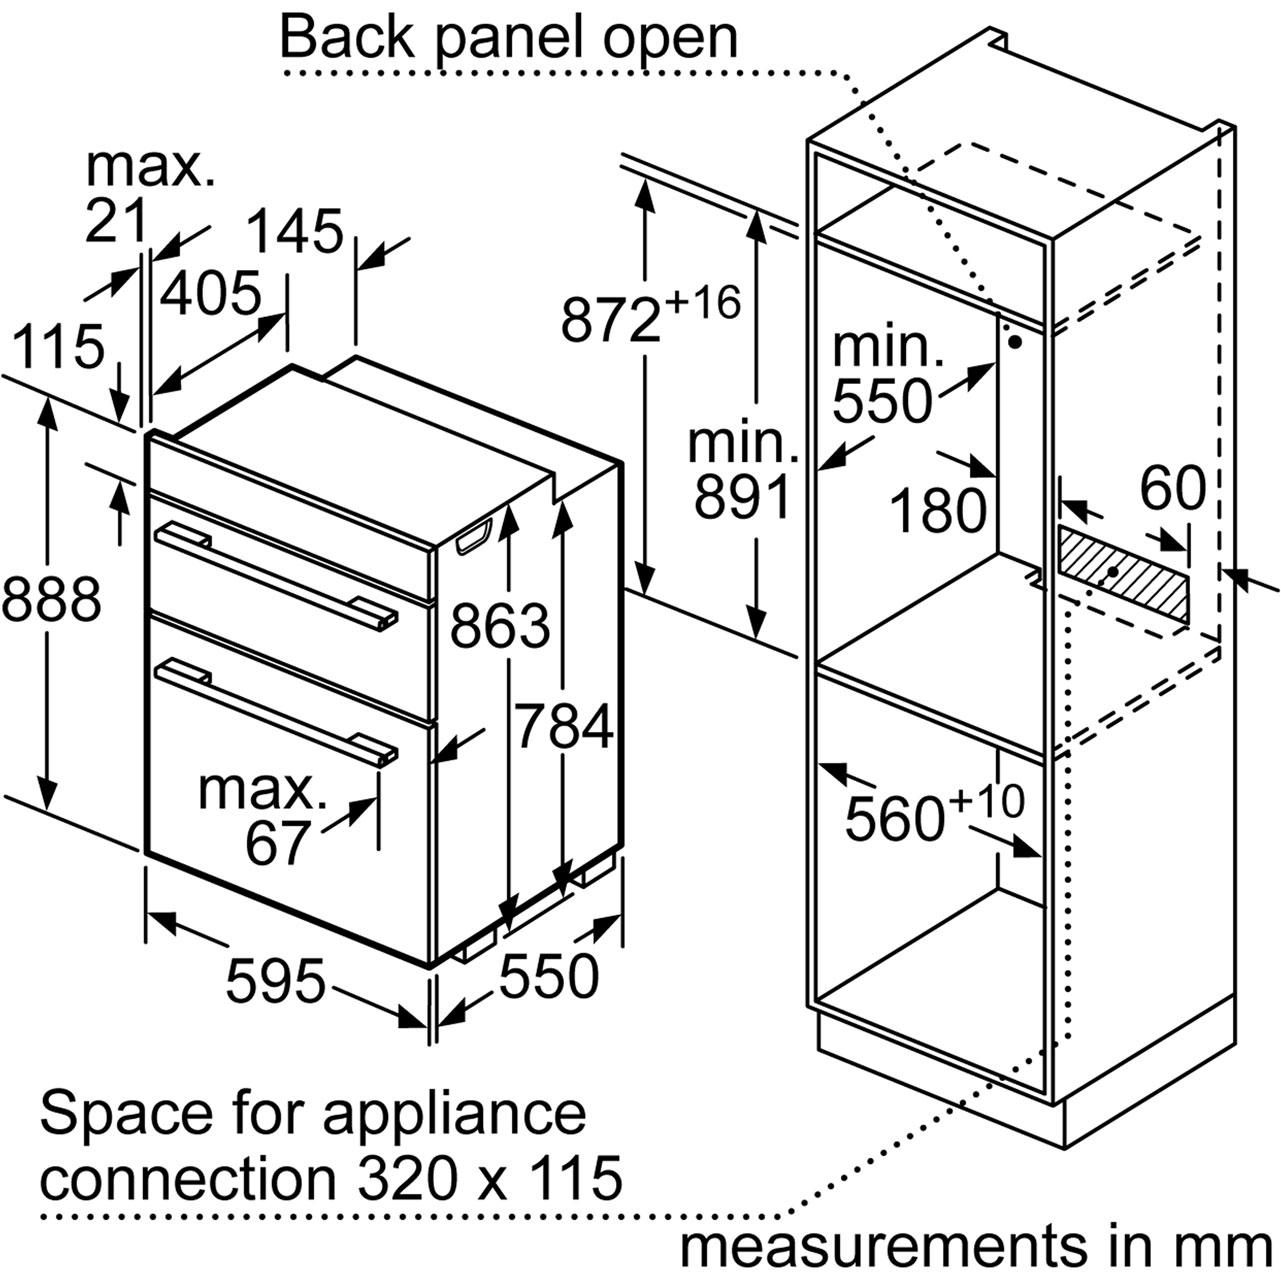 hbm43b250b_bs_bosch_doubleovens_01_dim_l bosch serie 6 hbm43b250b built in double oven brushed steel bosch oven wiring diagram at honlapkeszites.co